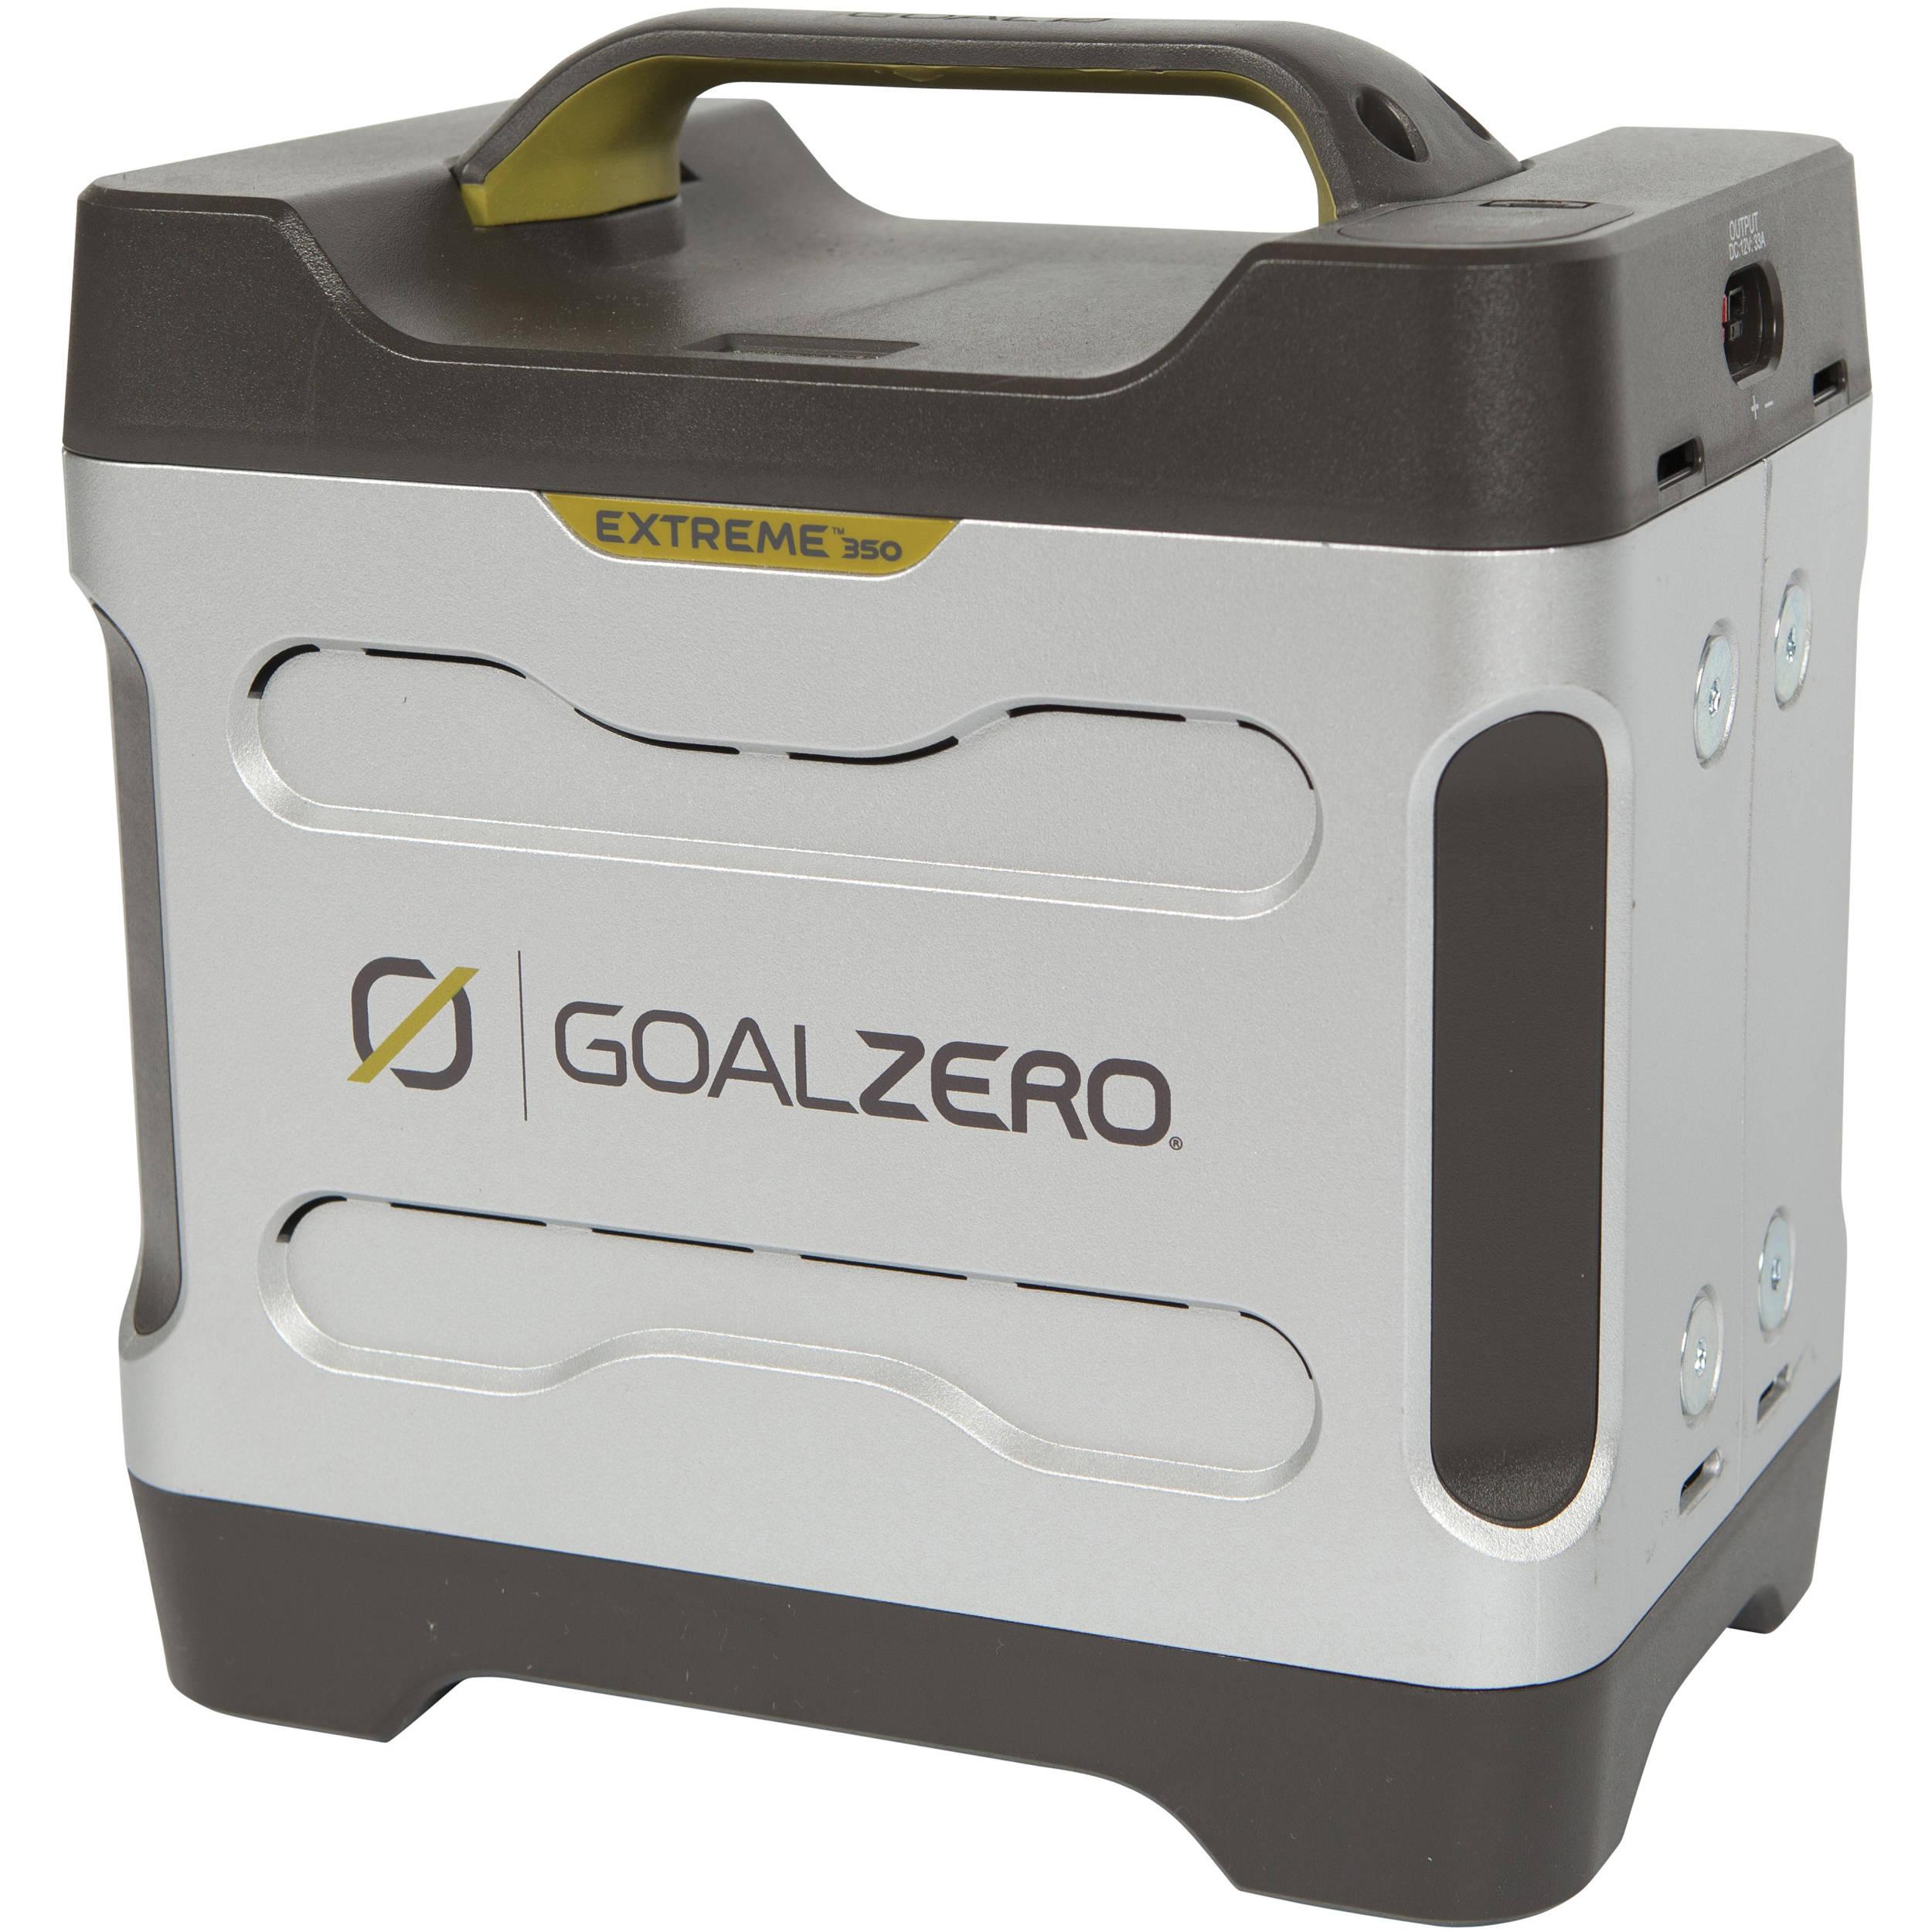 Goal Zero Extreme 350 Battery Pack